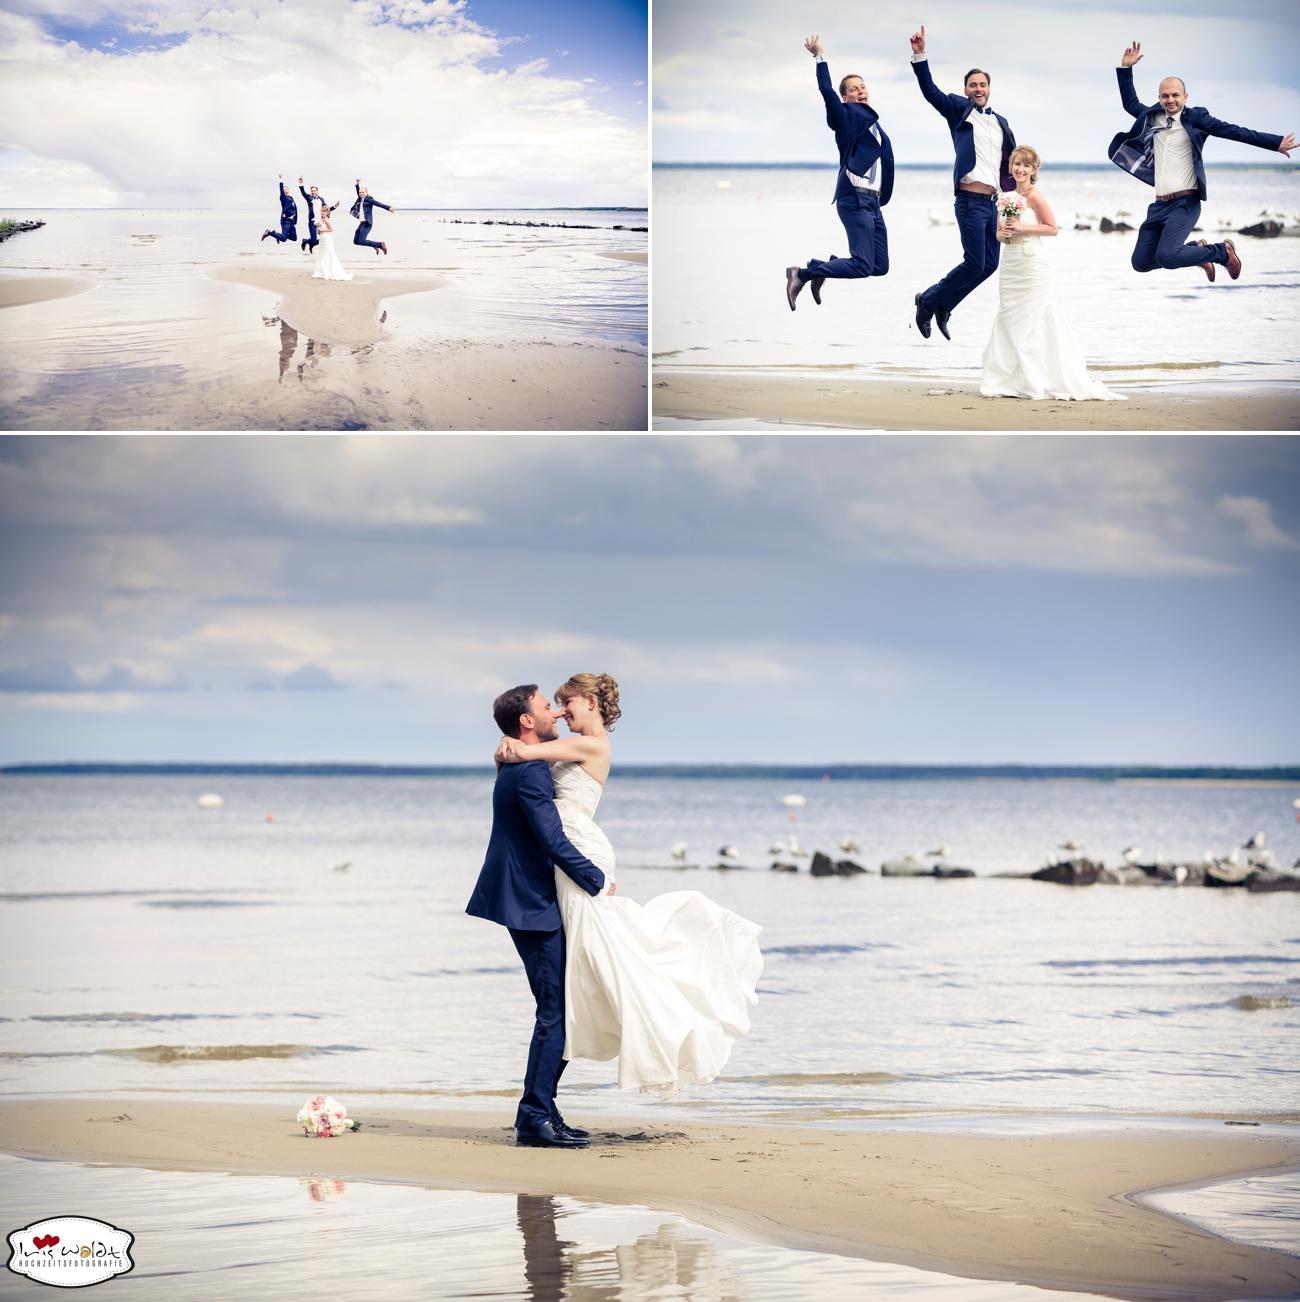 Heiraten in Uekermuende 17